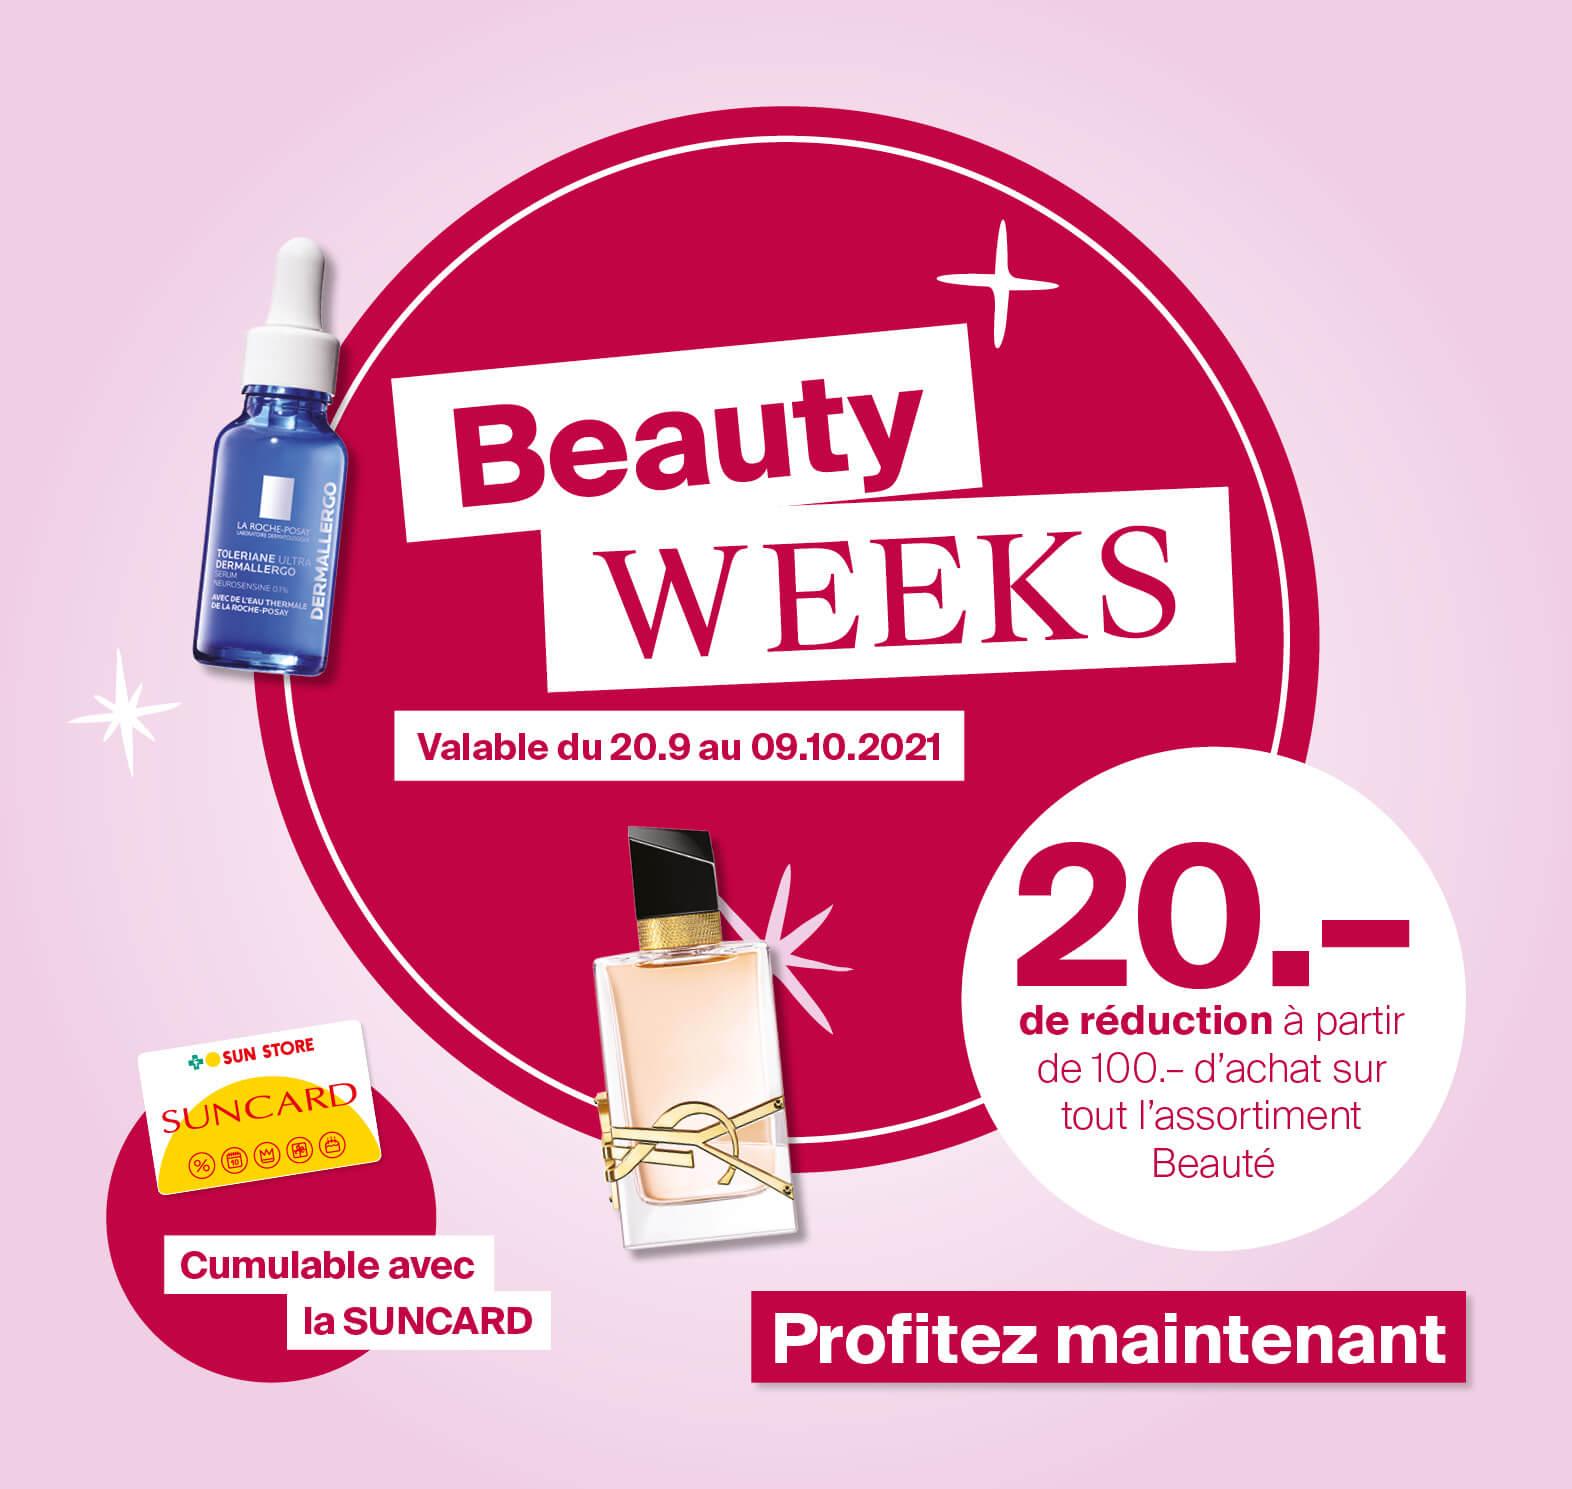 Beauty Weeks